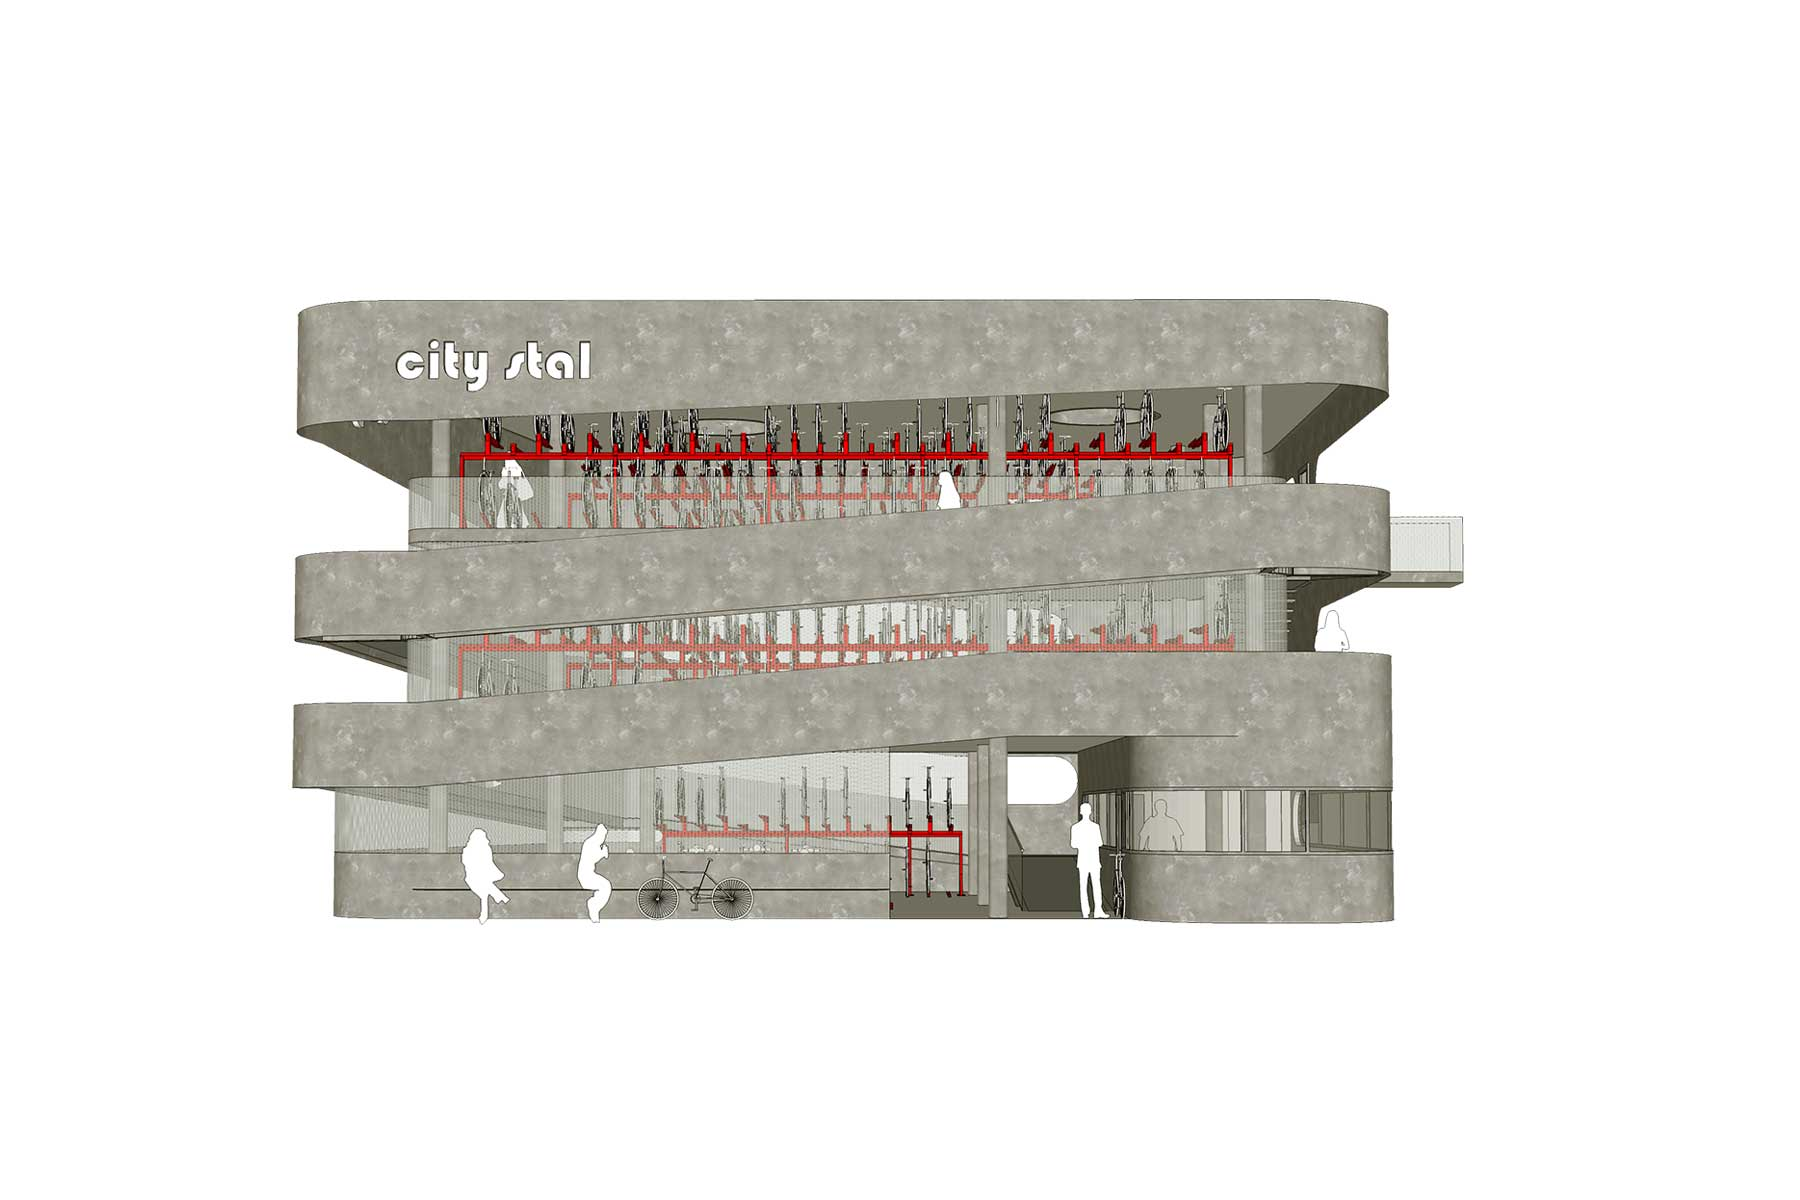 8A-Architecten-city-stal-nieuwegein-13